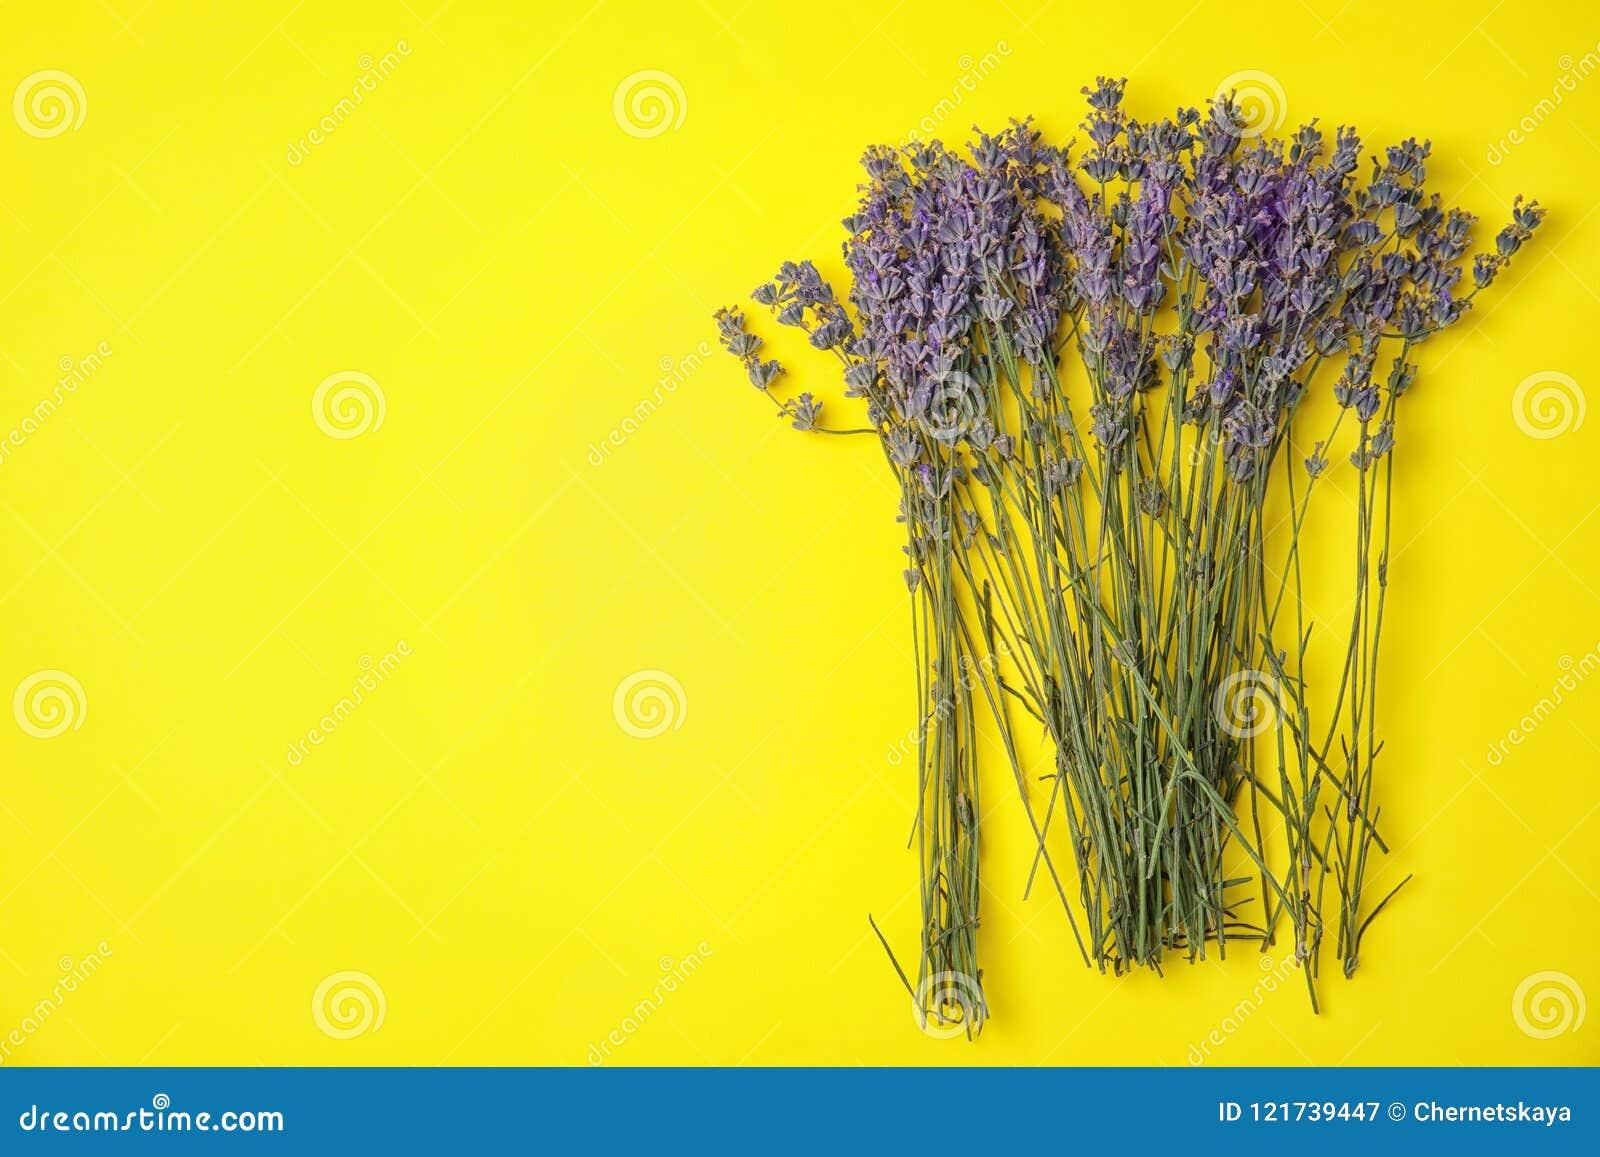 Lavender flowers on color background